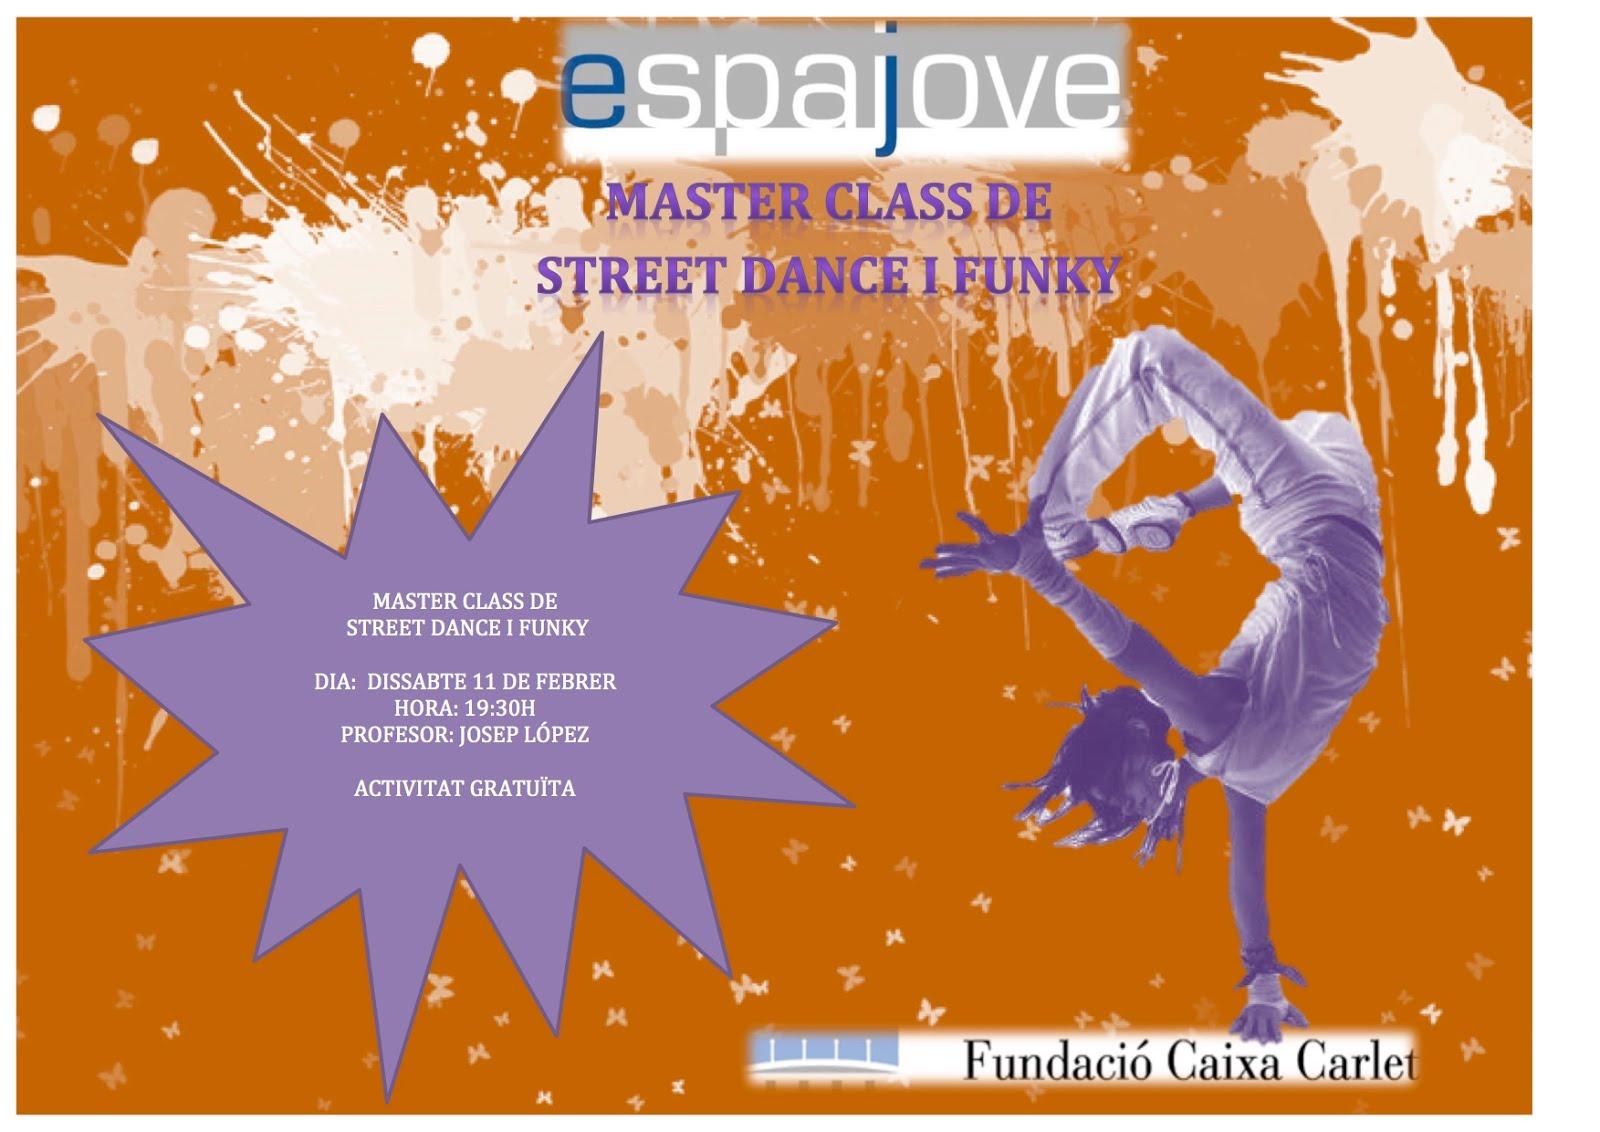 MASTER CLASS DE STREET DANCE I FUNKY